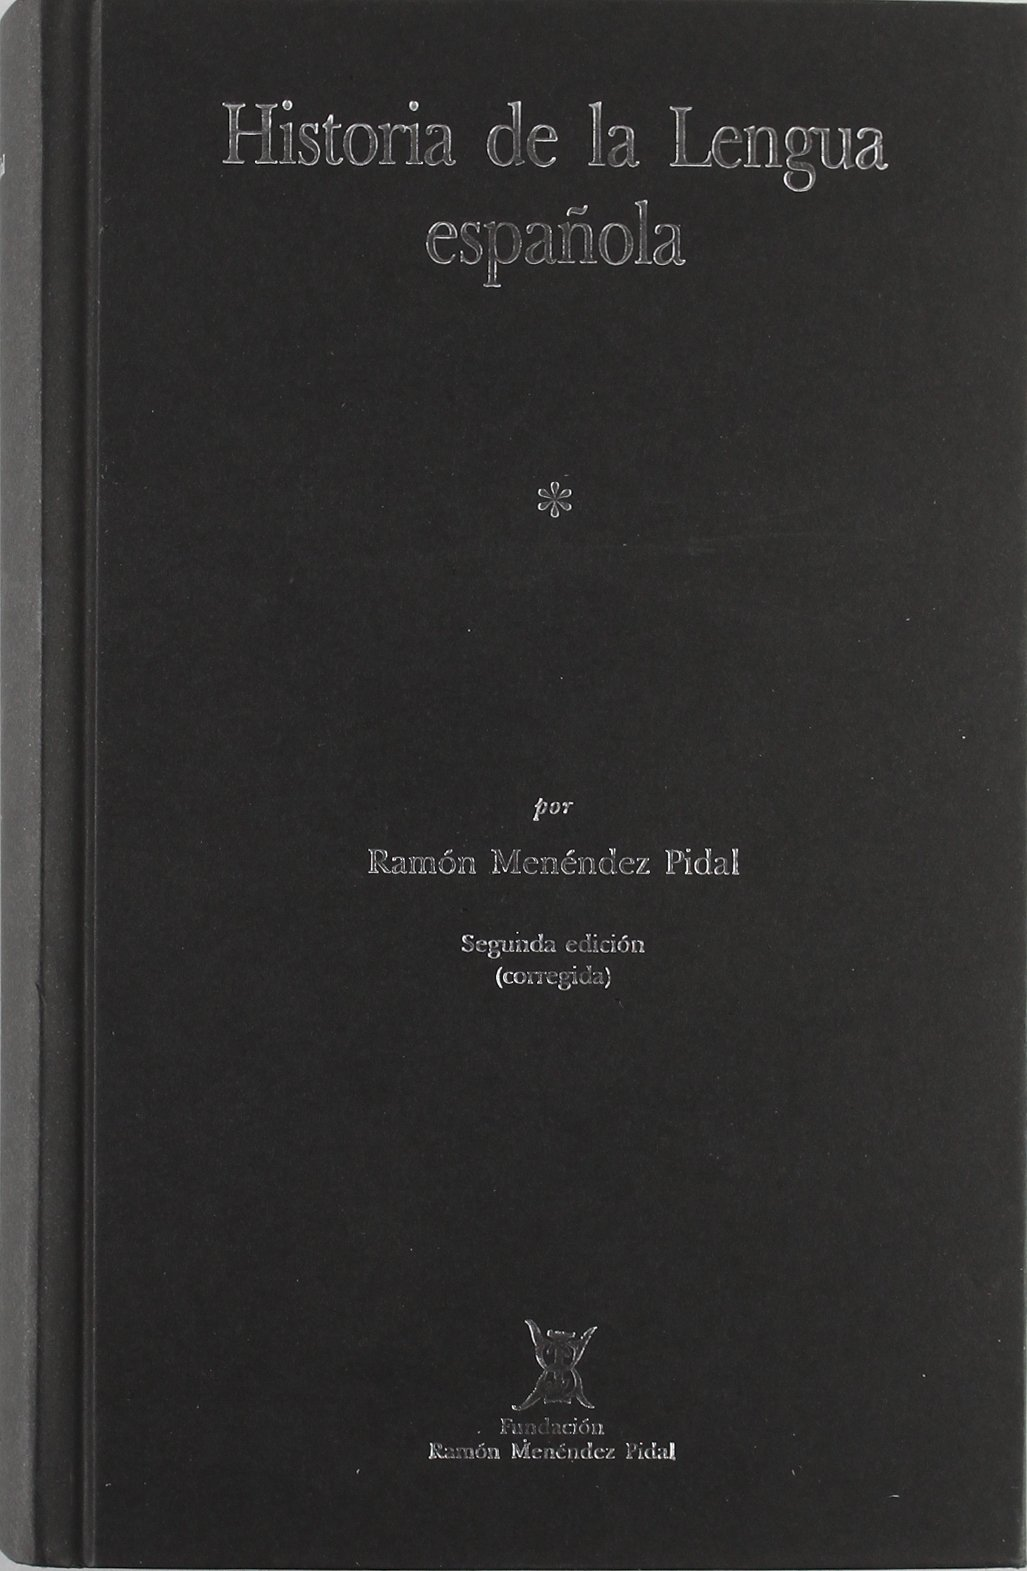 Historia de la lengua española(2 vols.): Amazon.es: Menendez Pidal, Ramon: Libros